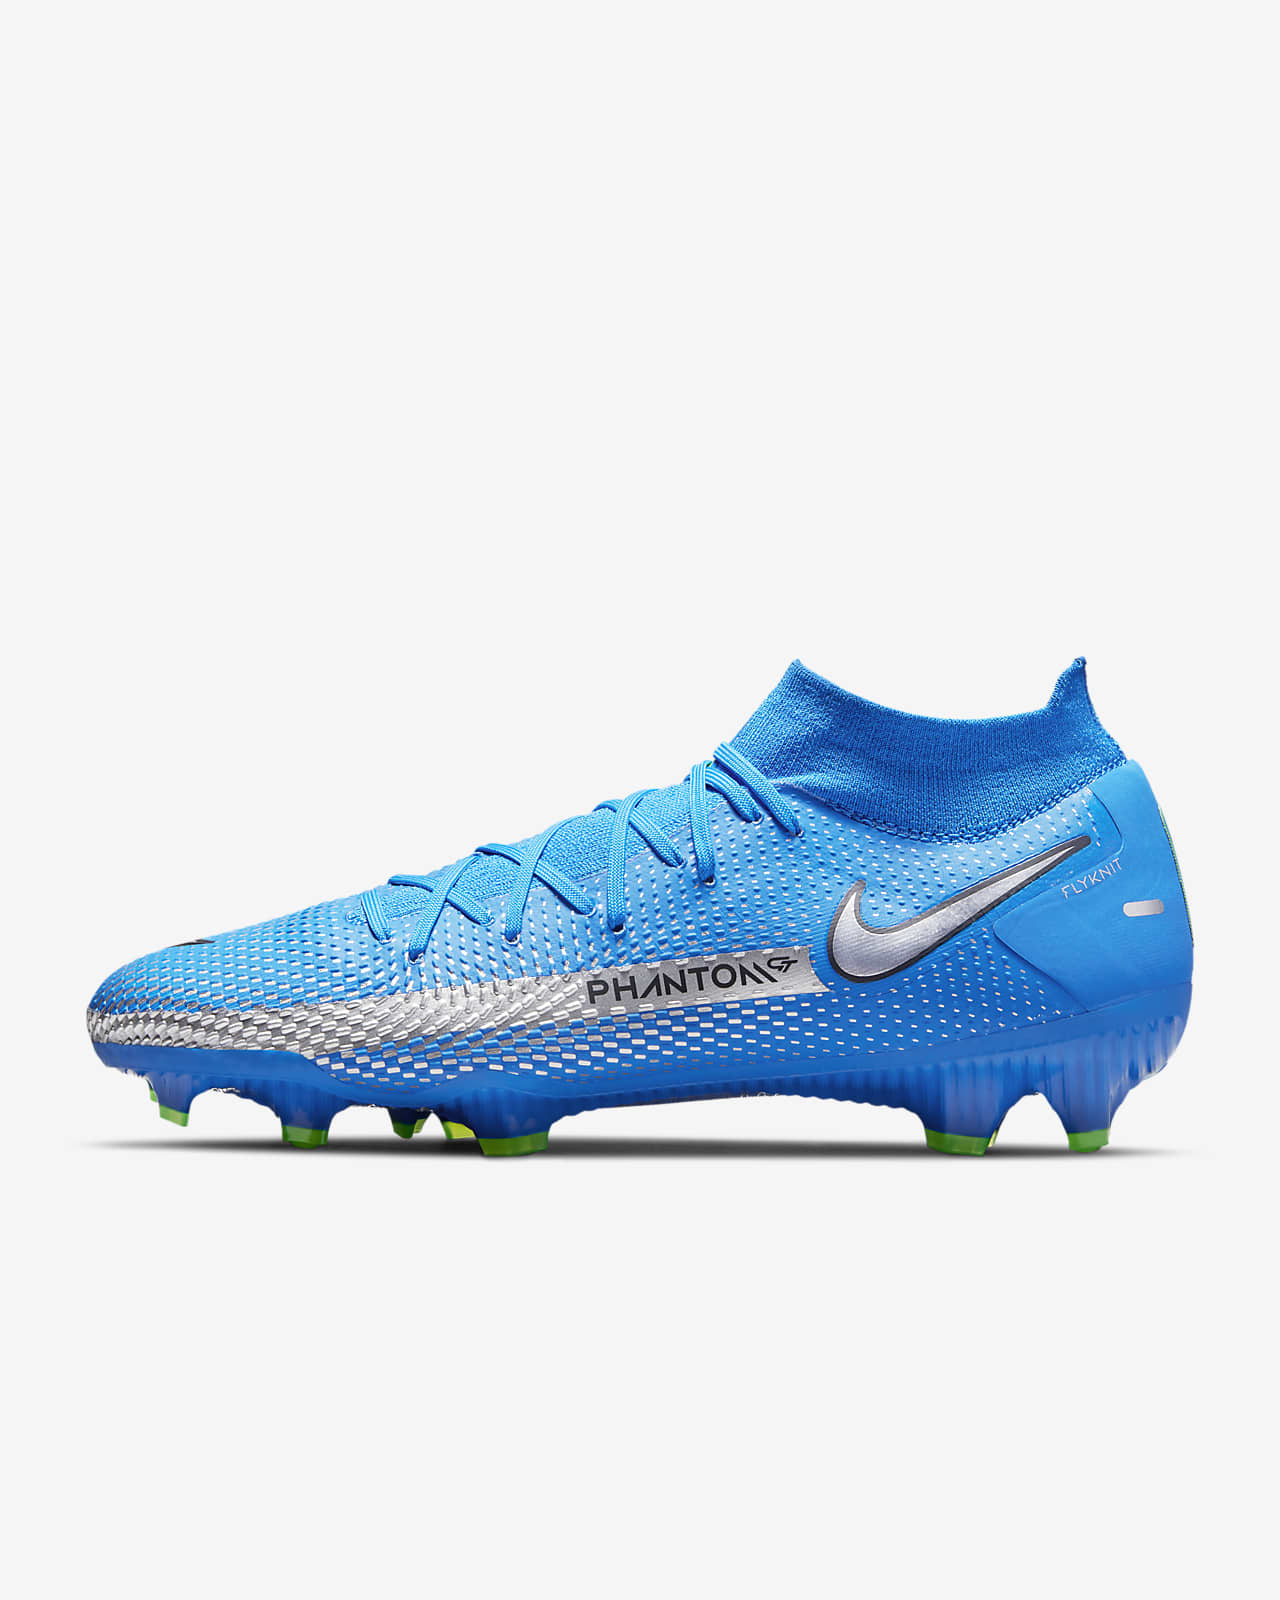 Calzado de fútbol para terreno firme Nike Phantom GT Pro Dynamic Fit FG